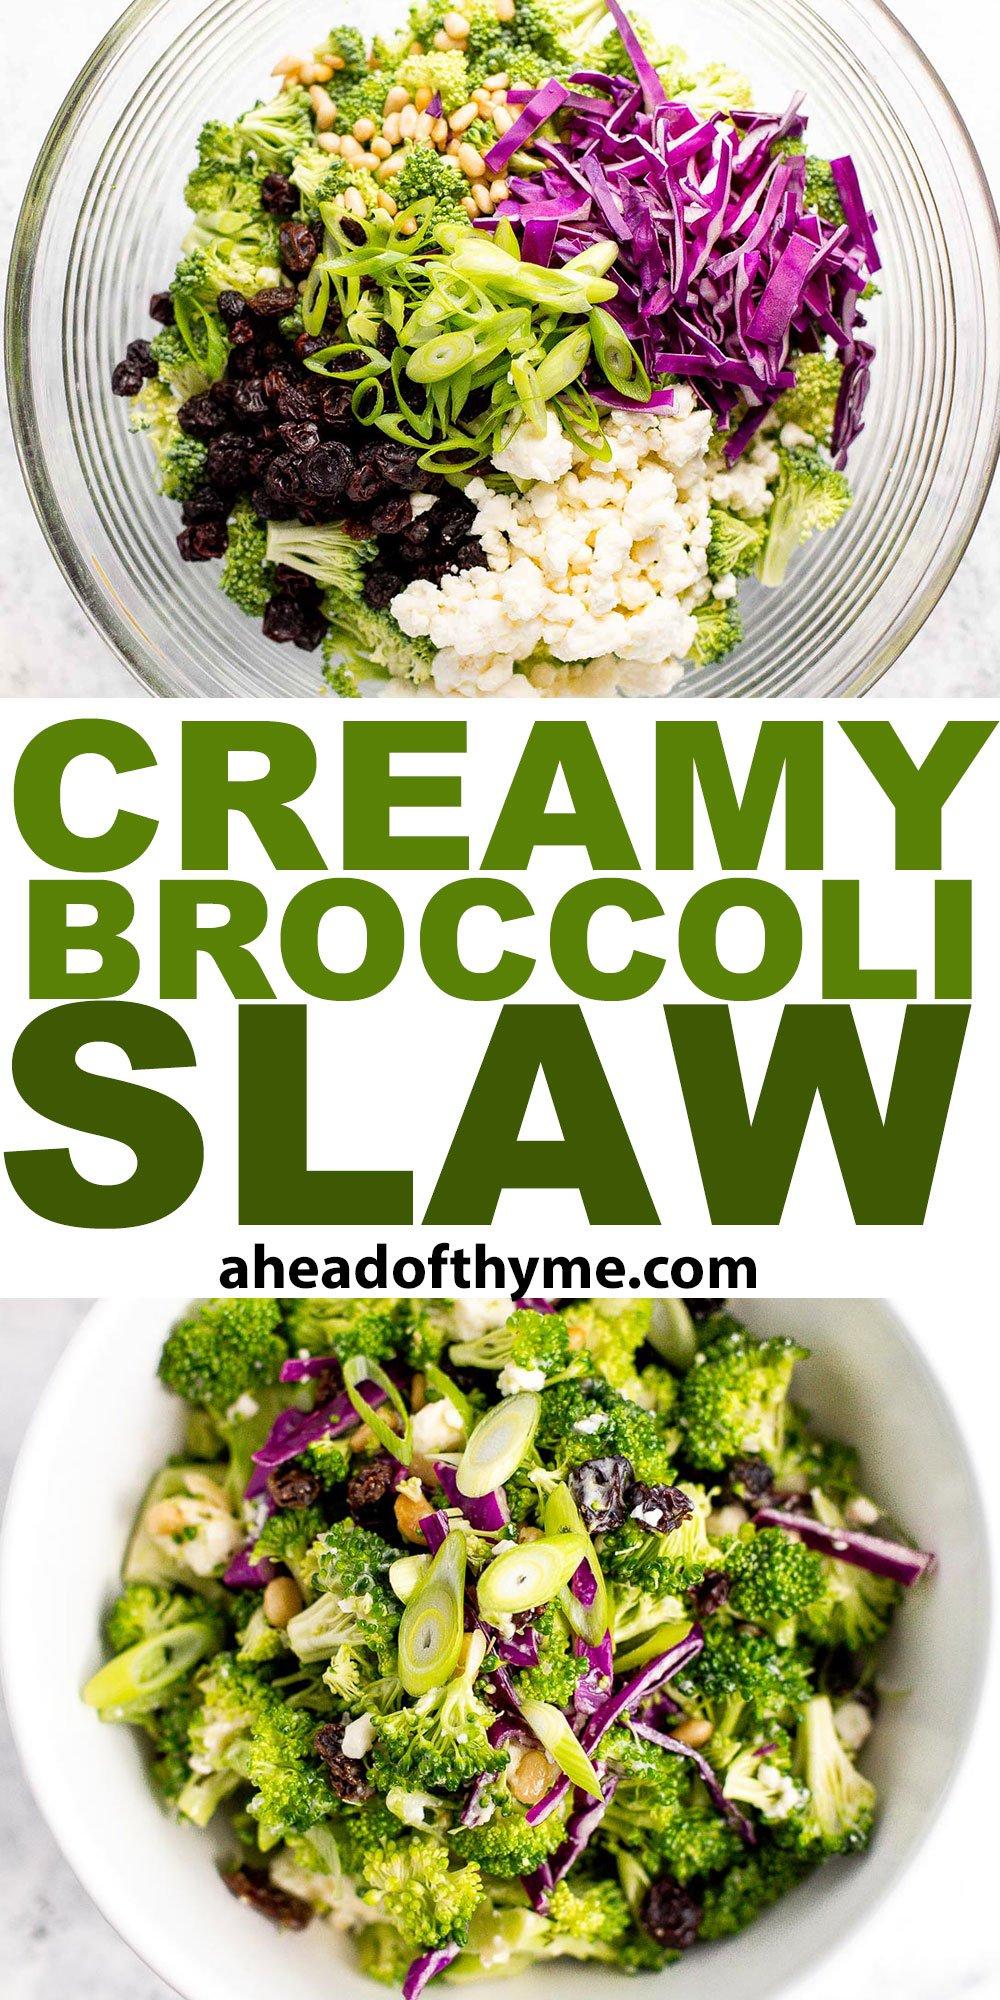 Creamy Broccoli Slaw Salad